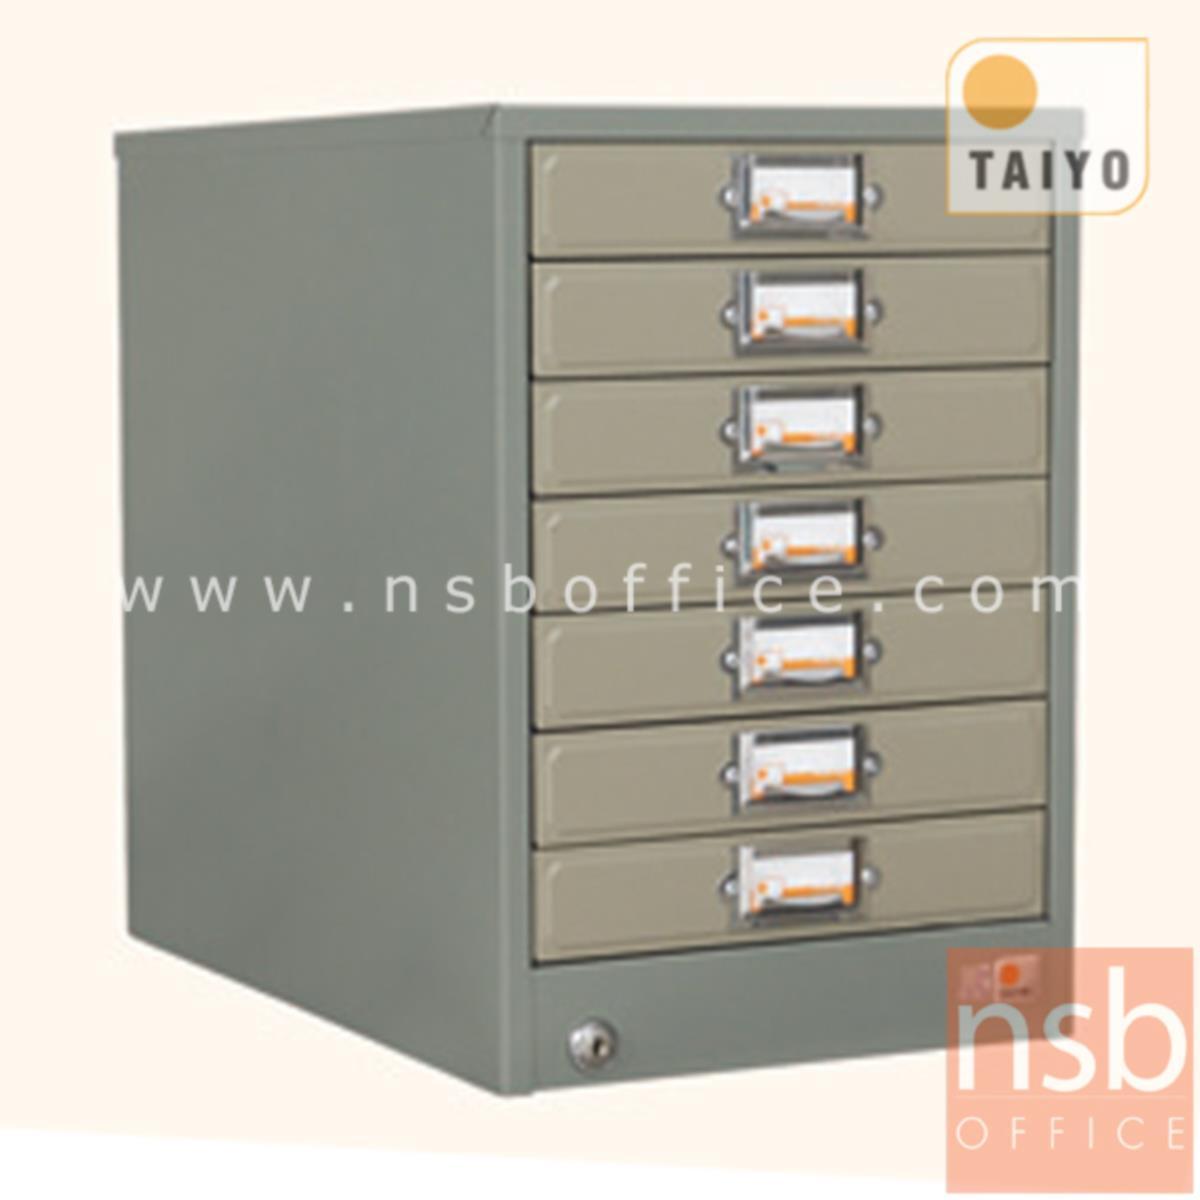 E02A028:ตู้เก็บแบบฟอร์ม 7 ลิ้นชัก ตั้งโต๊ะ (กระดาษ A4) รุ่น FR-107